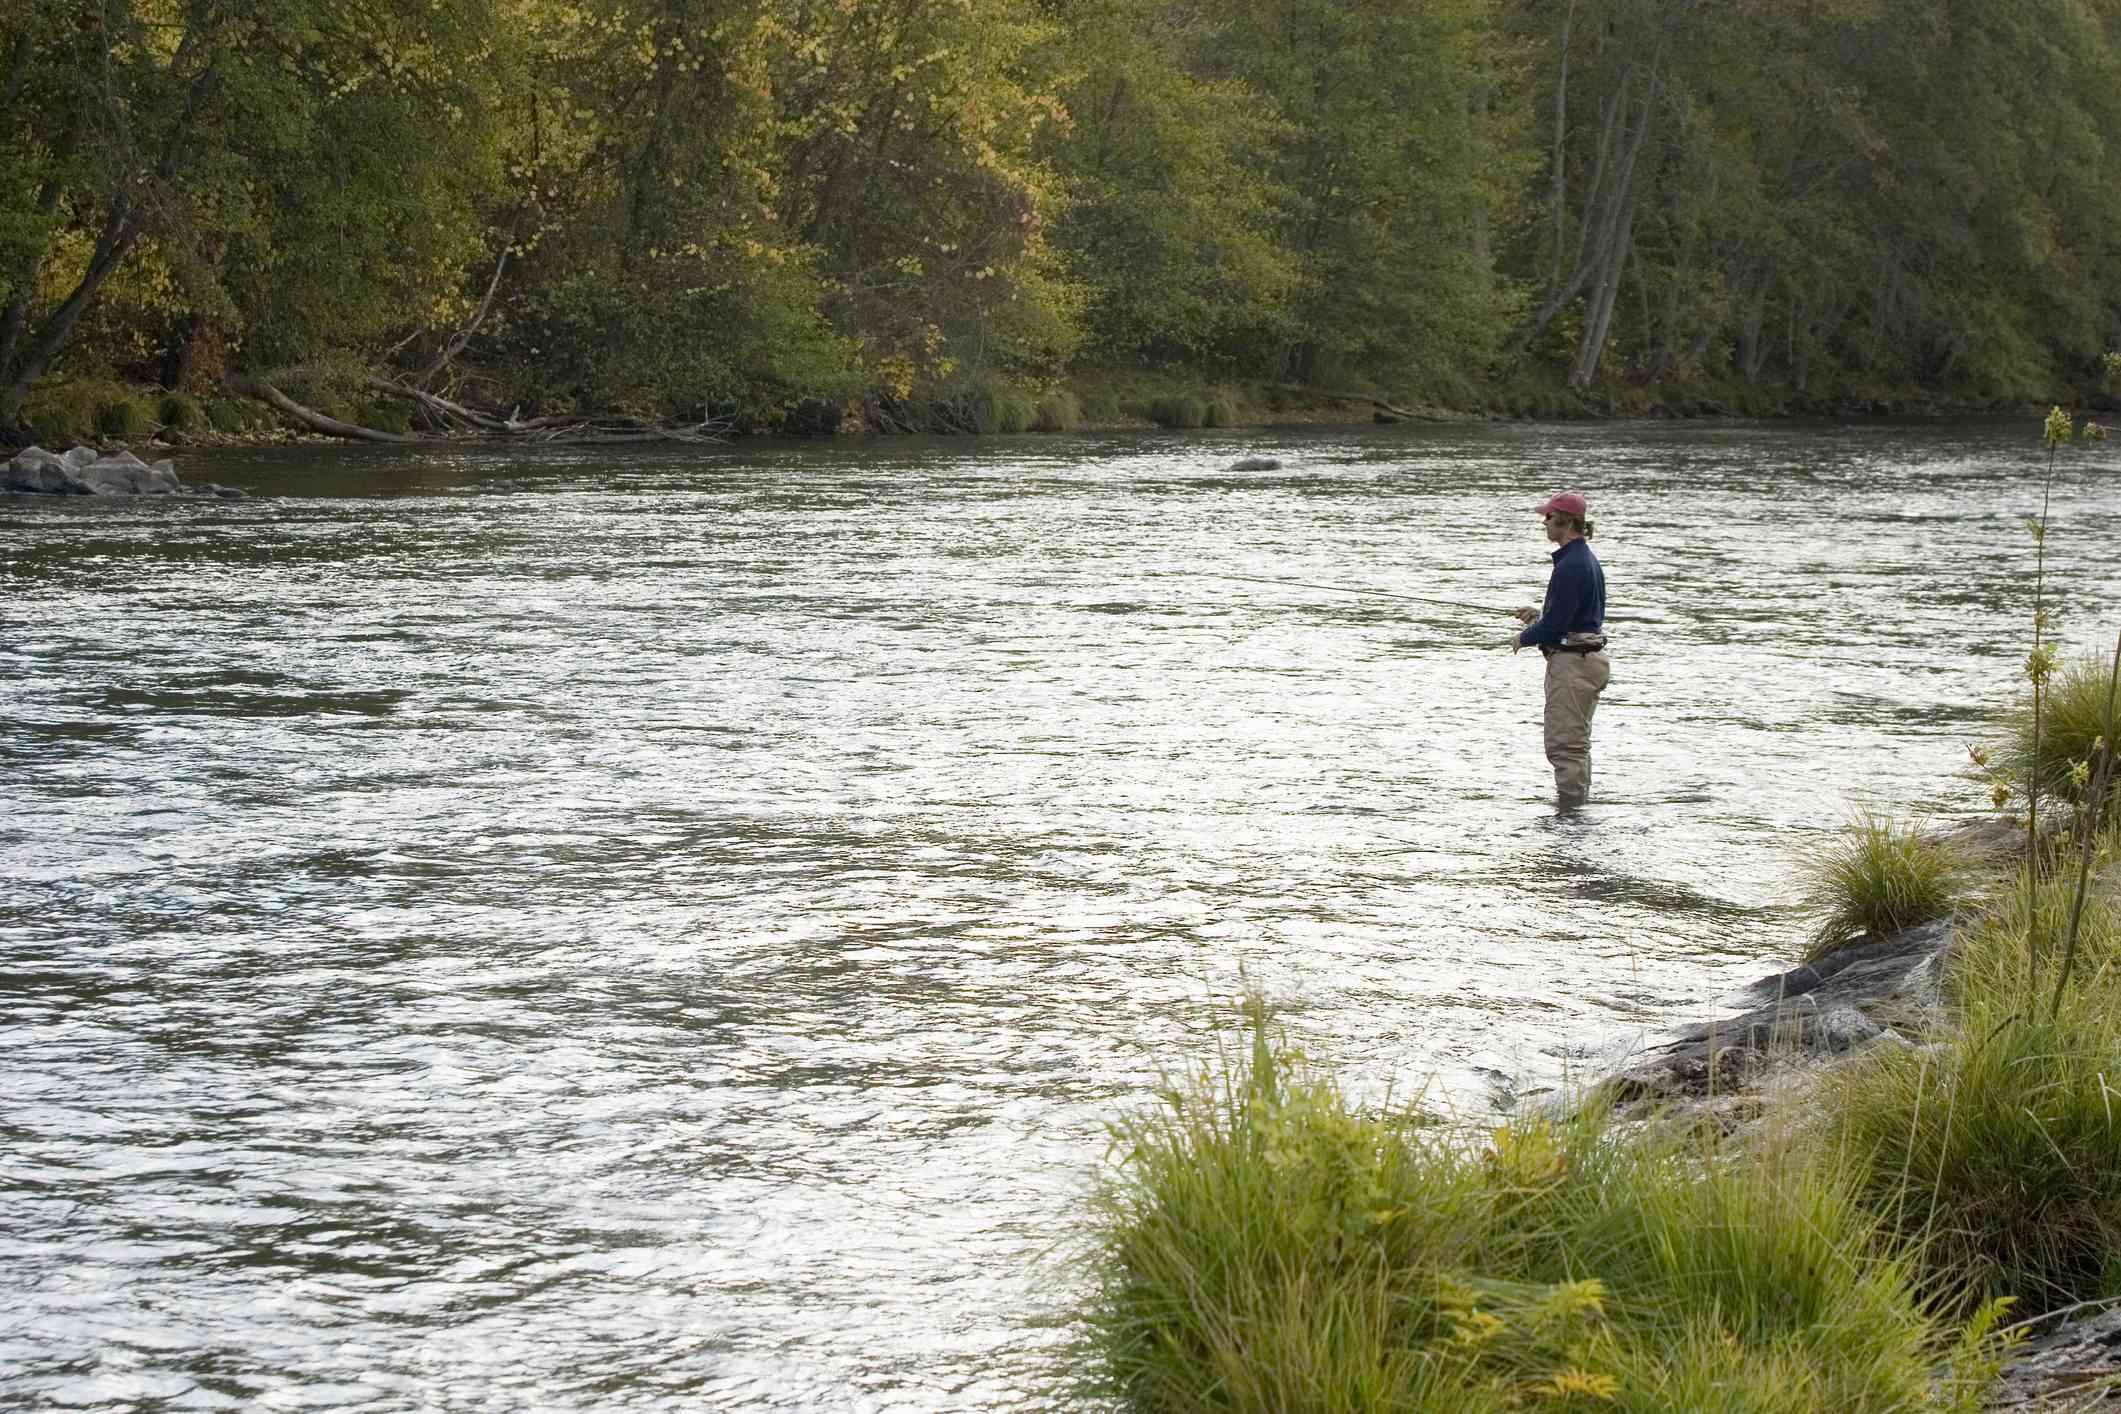 Fly fishing for steelhead trout.